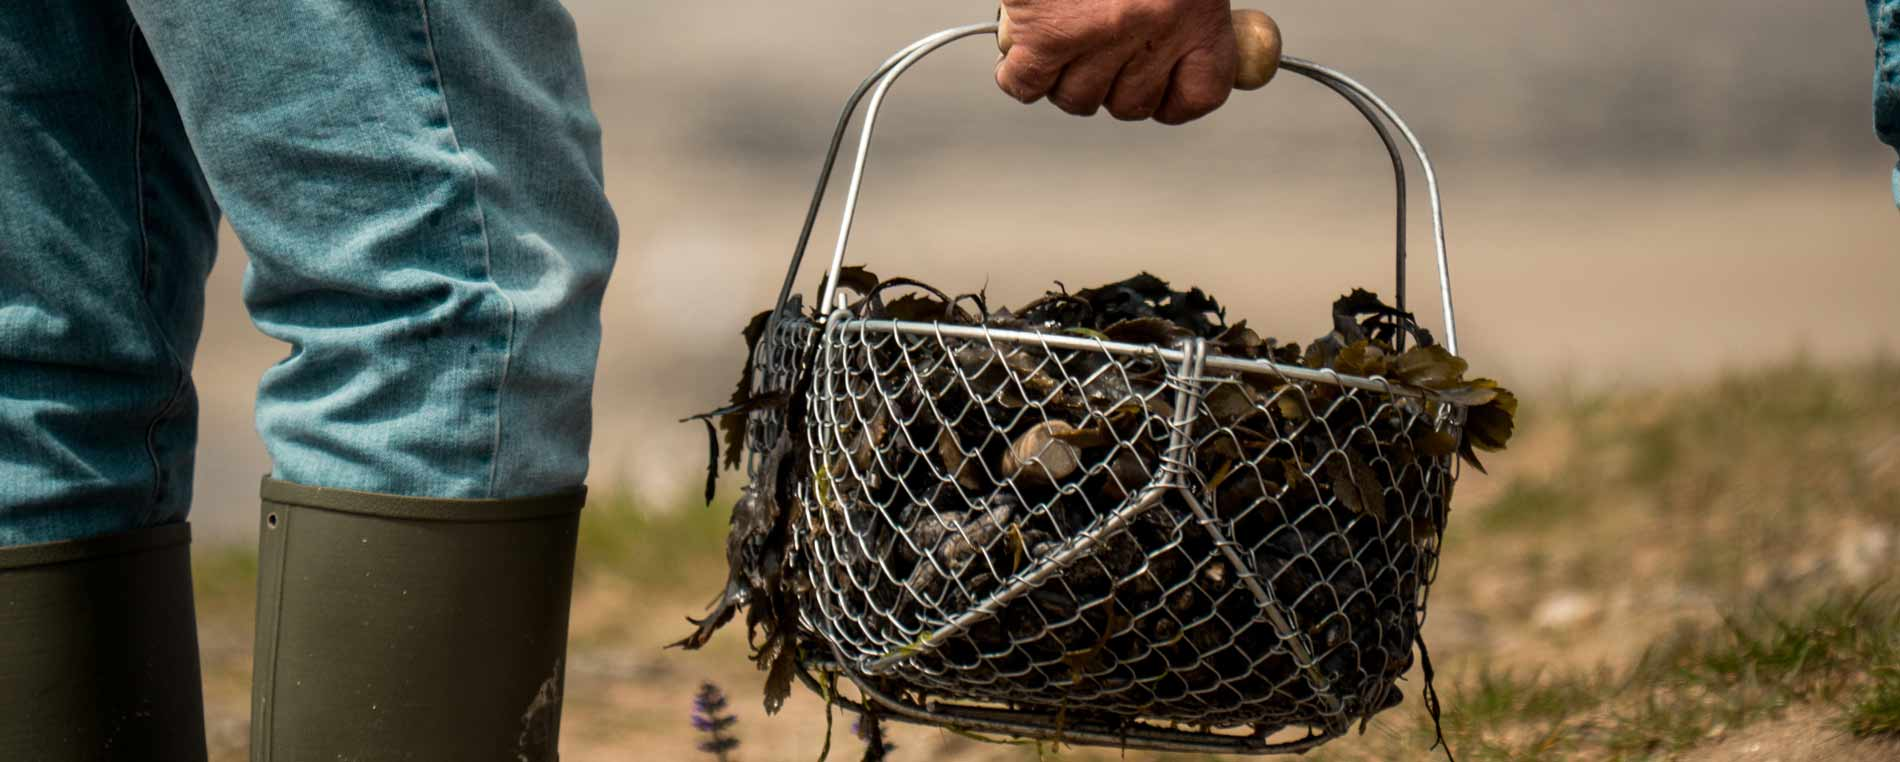 Les spots de pêche à pied à Carantec